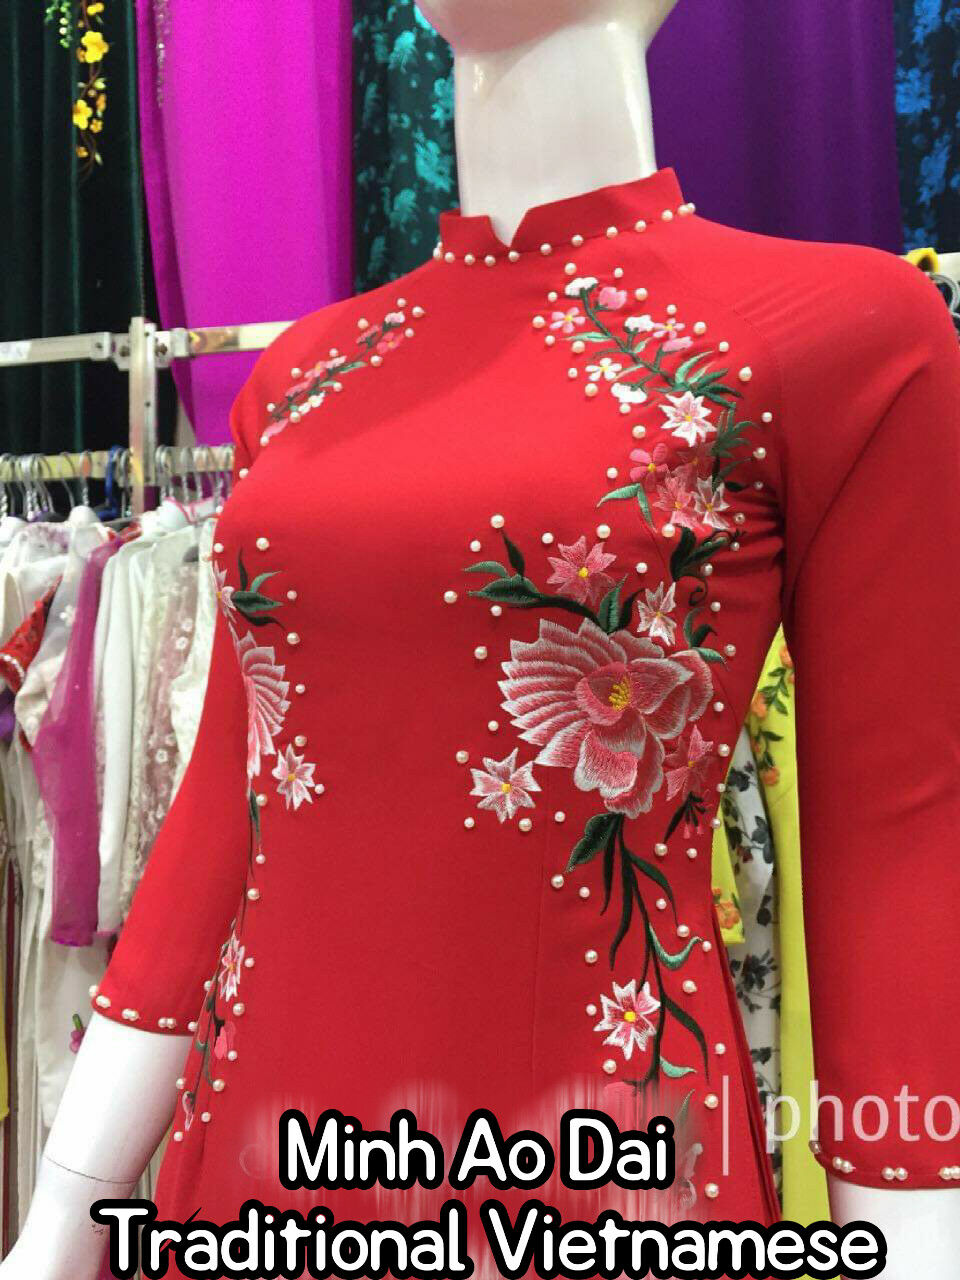 Red Embroidered Embroidered Embroidered Flowers 4 Flap Handmade Ao Dai Vietnamese +The Head Scarf f35ab4